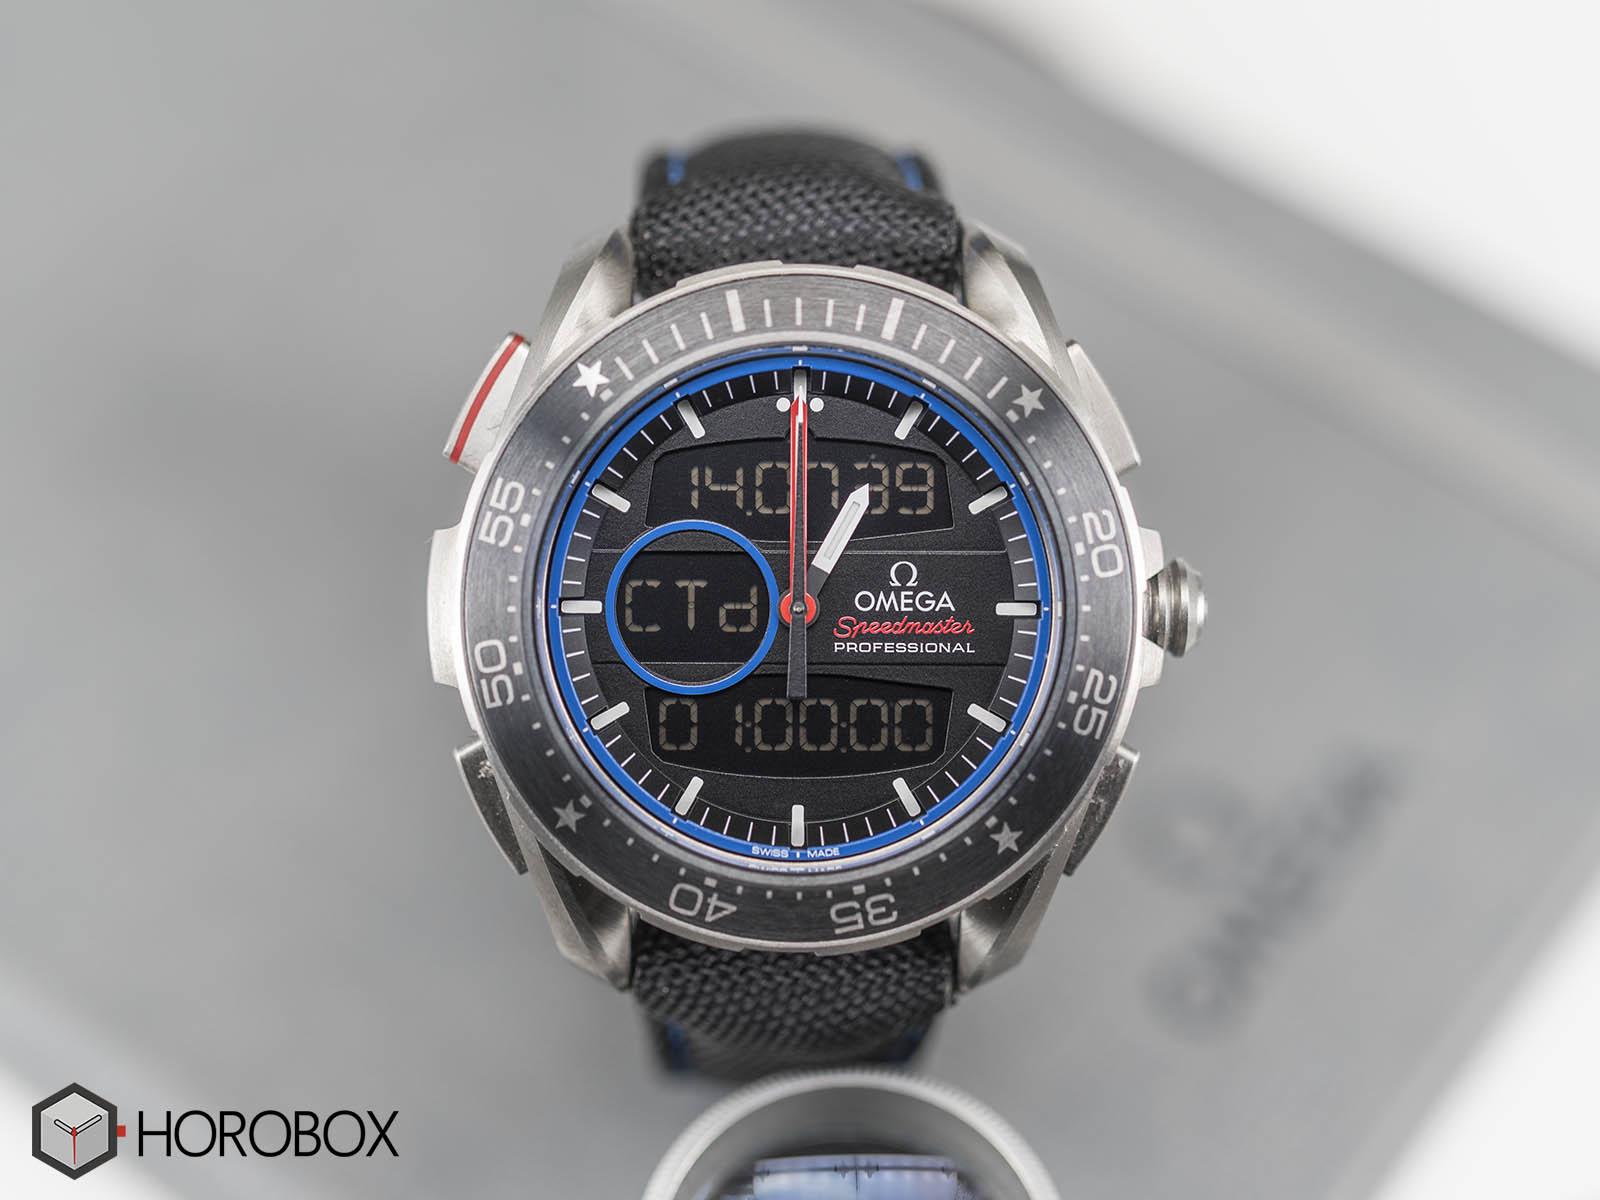 omega-speedmaster-x-33-regatta-chronograph-318-92-45-79-01-001-2-.jpg